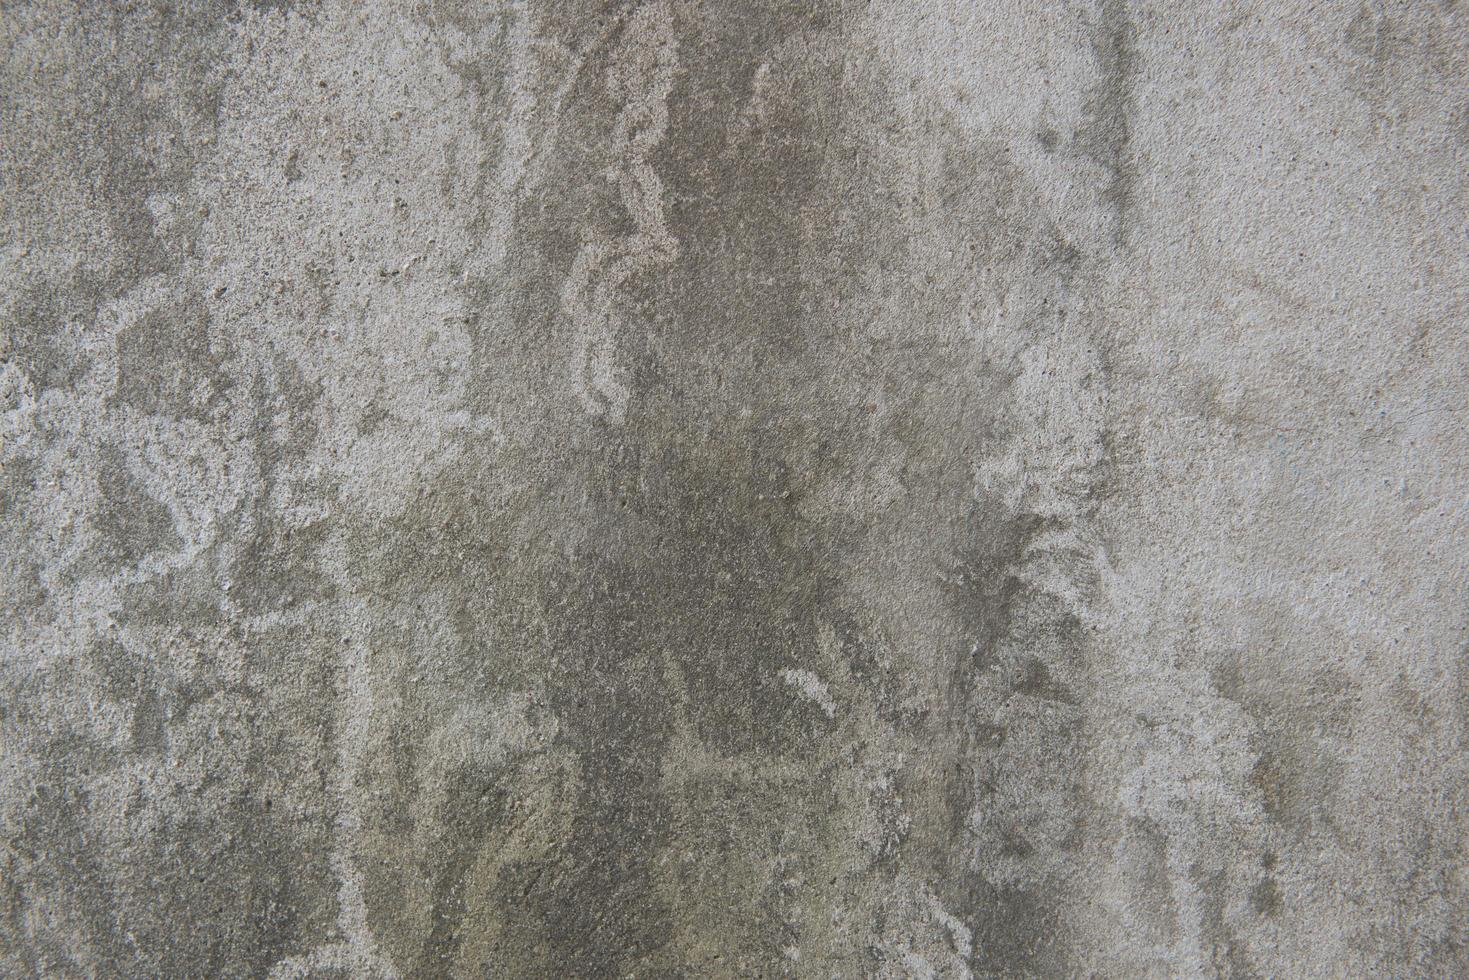 betongvägg textur bakgrund. grunge cement abstrakt konst foto